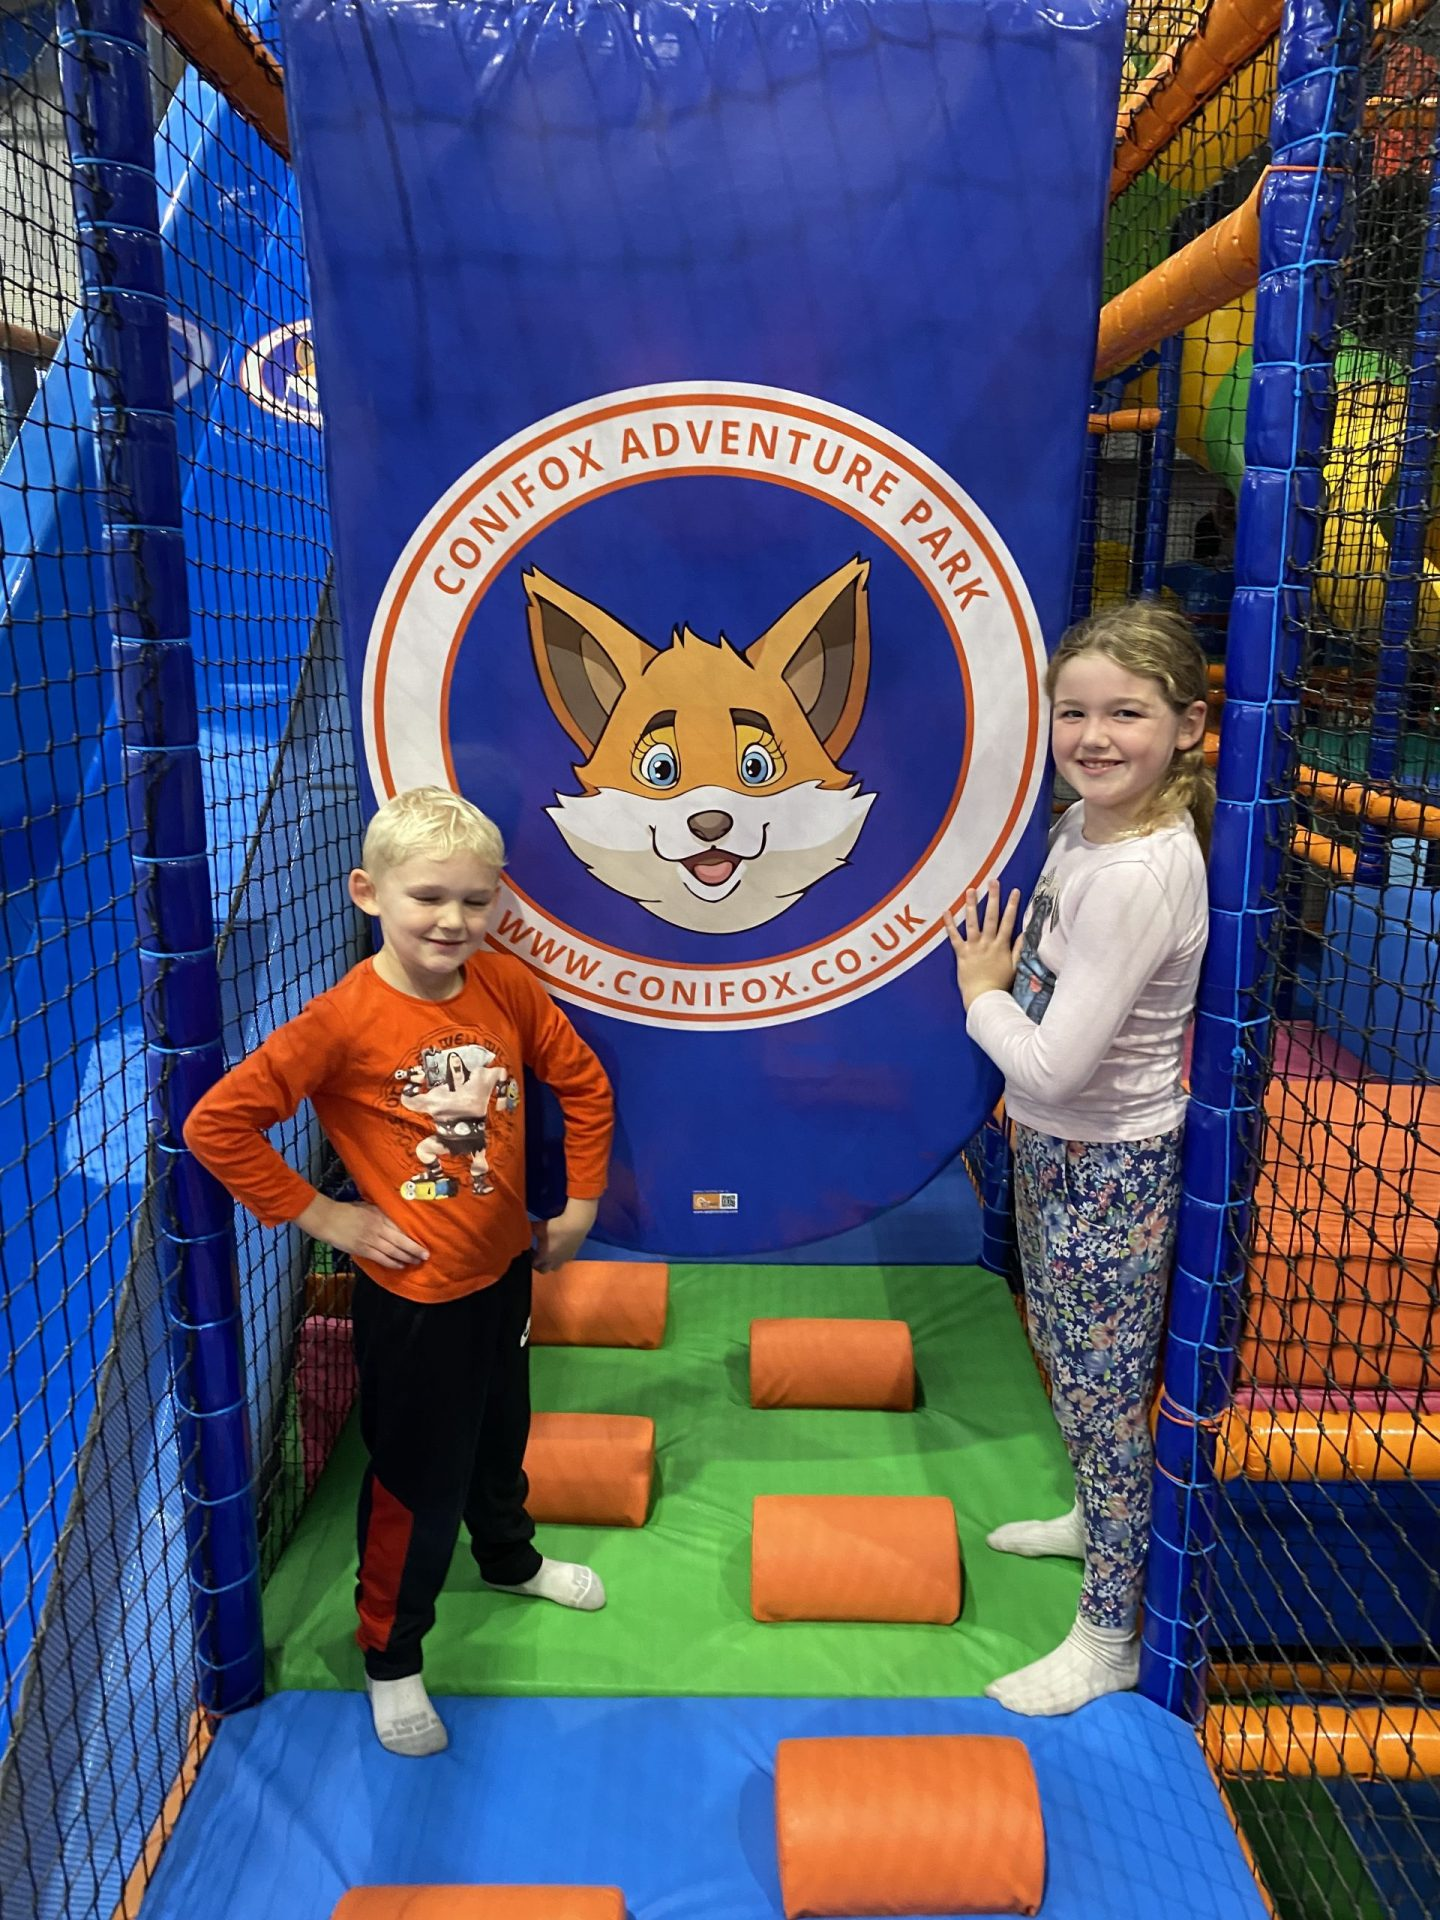 Conifox new indoor play centre